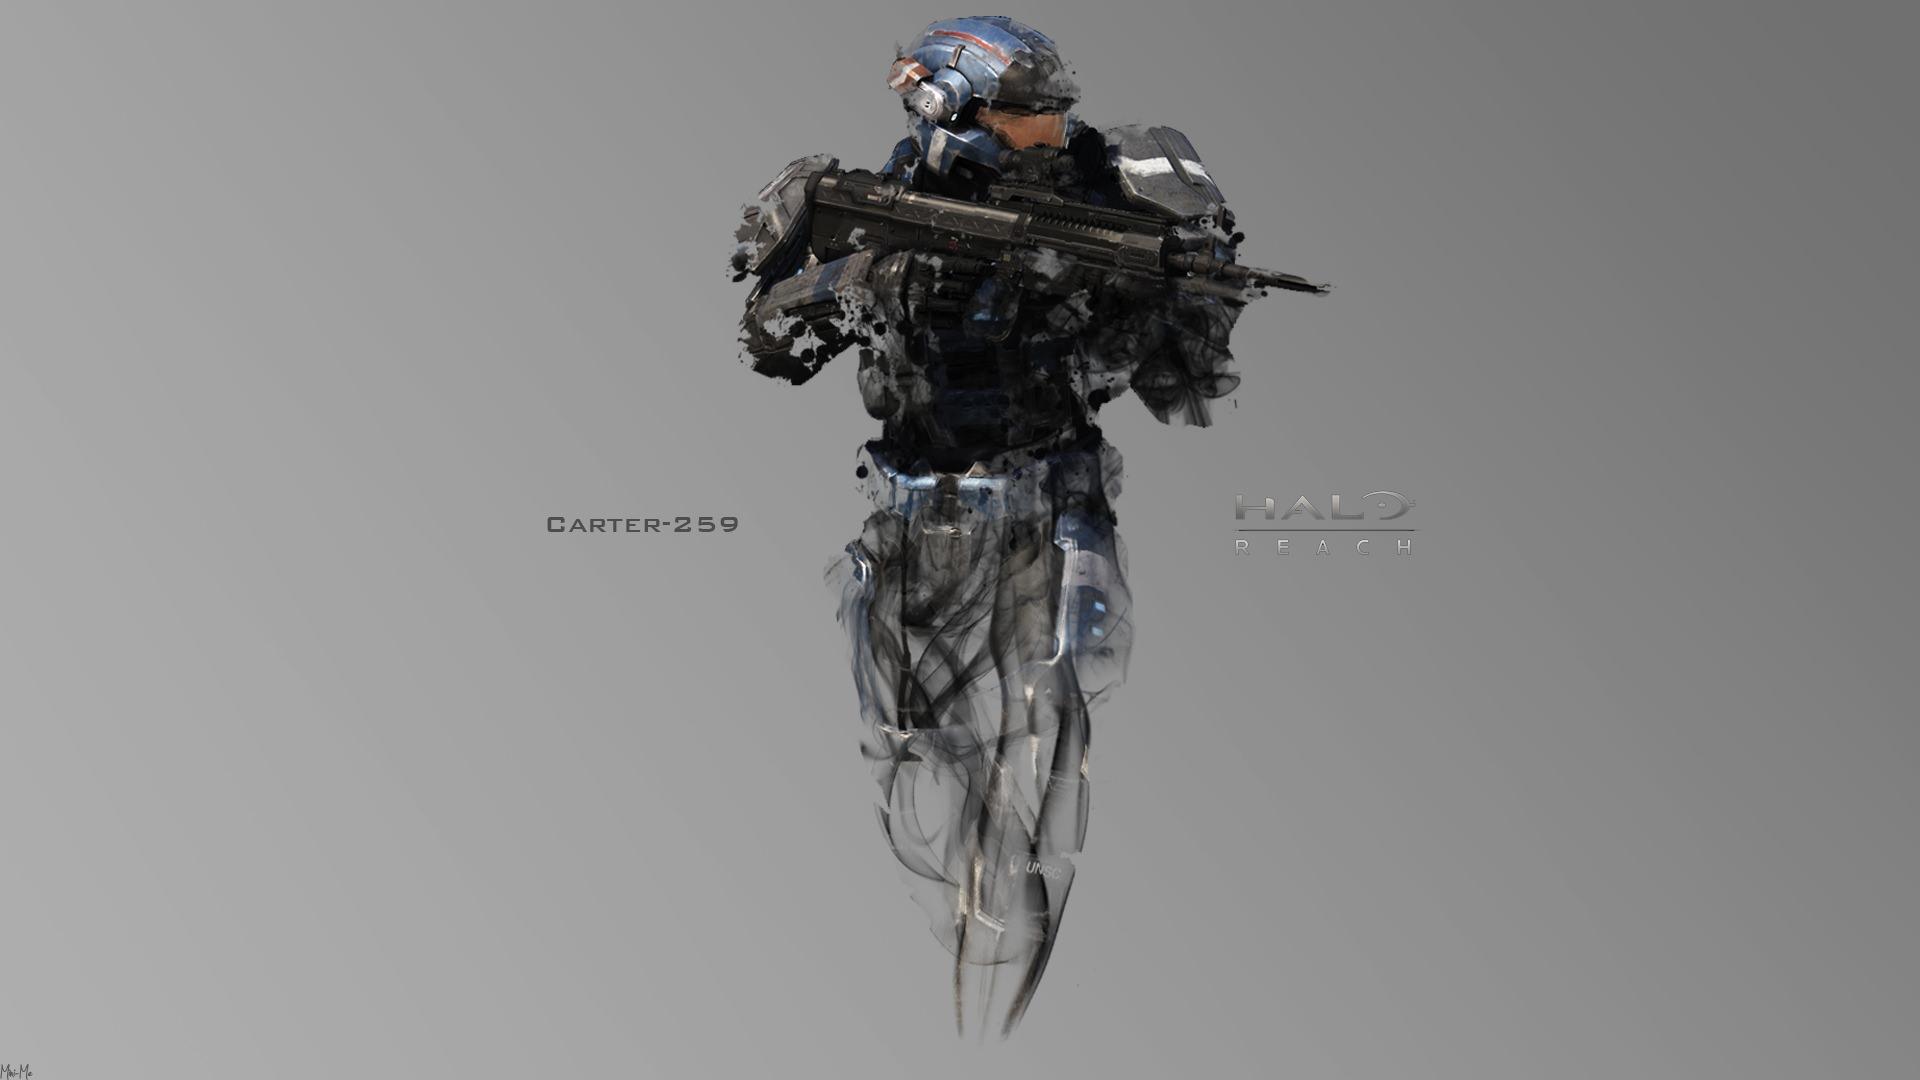 Halo Soldier with Gun Wallpaper